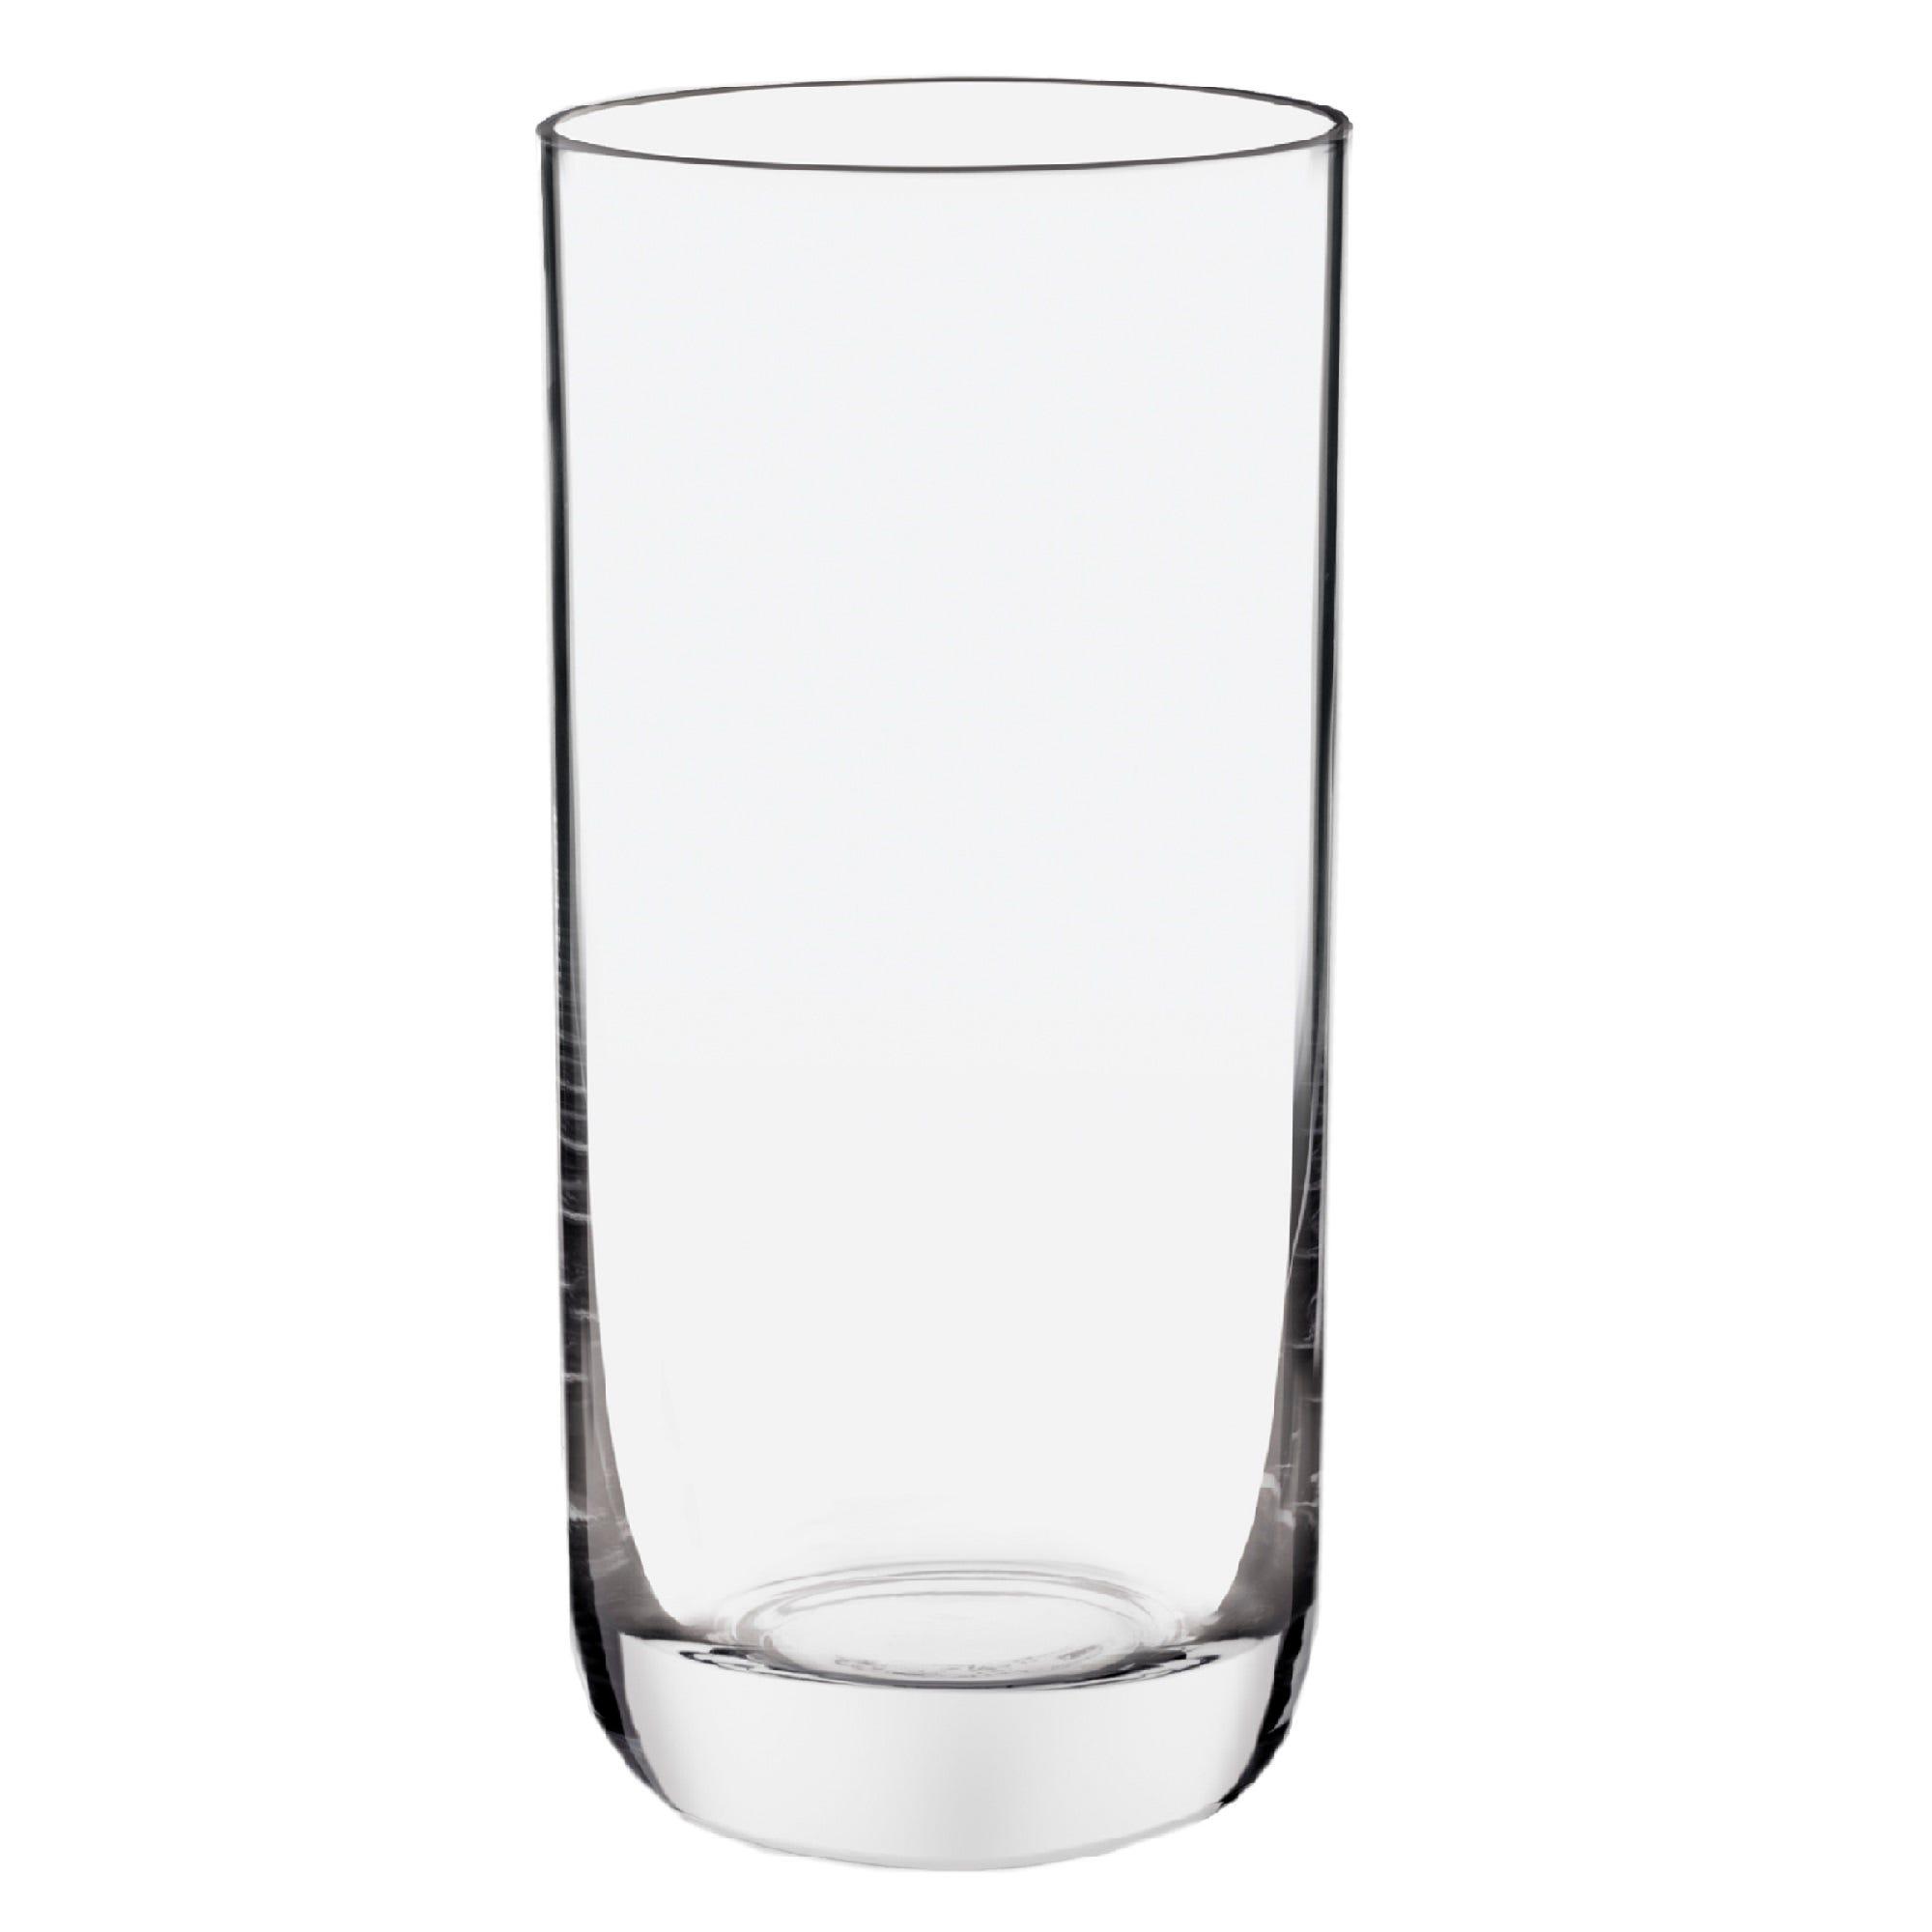 Vaso de vidrio para jugo Krosno Milano